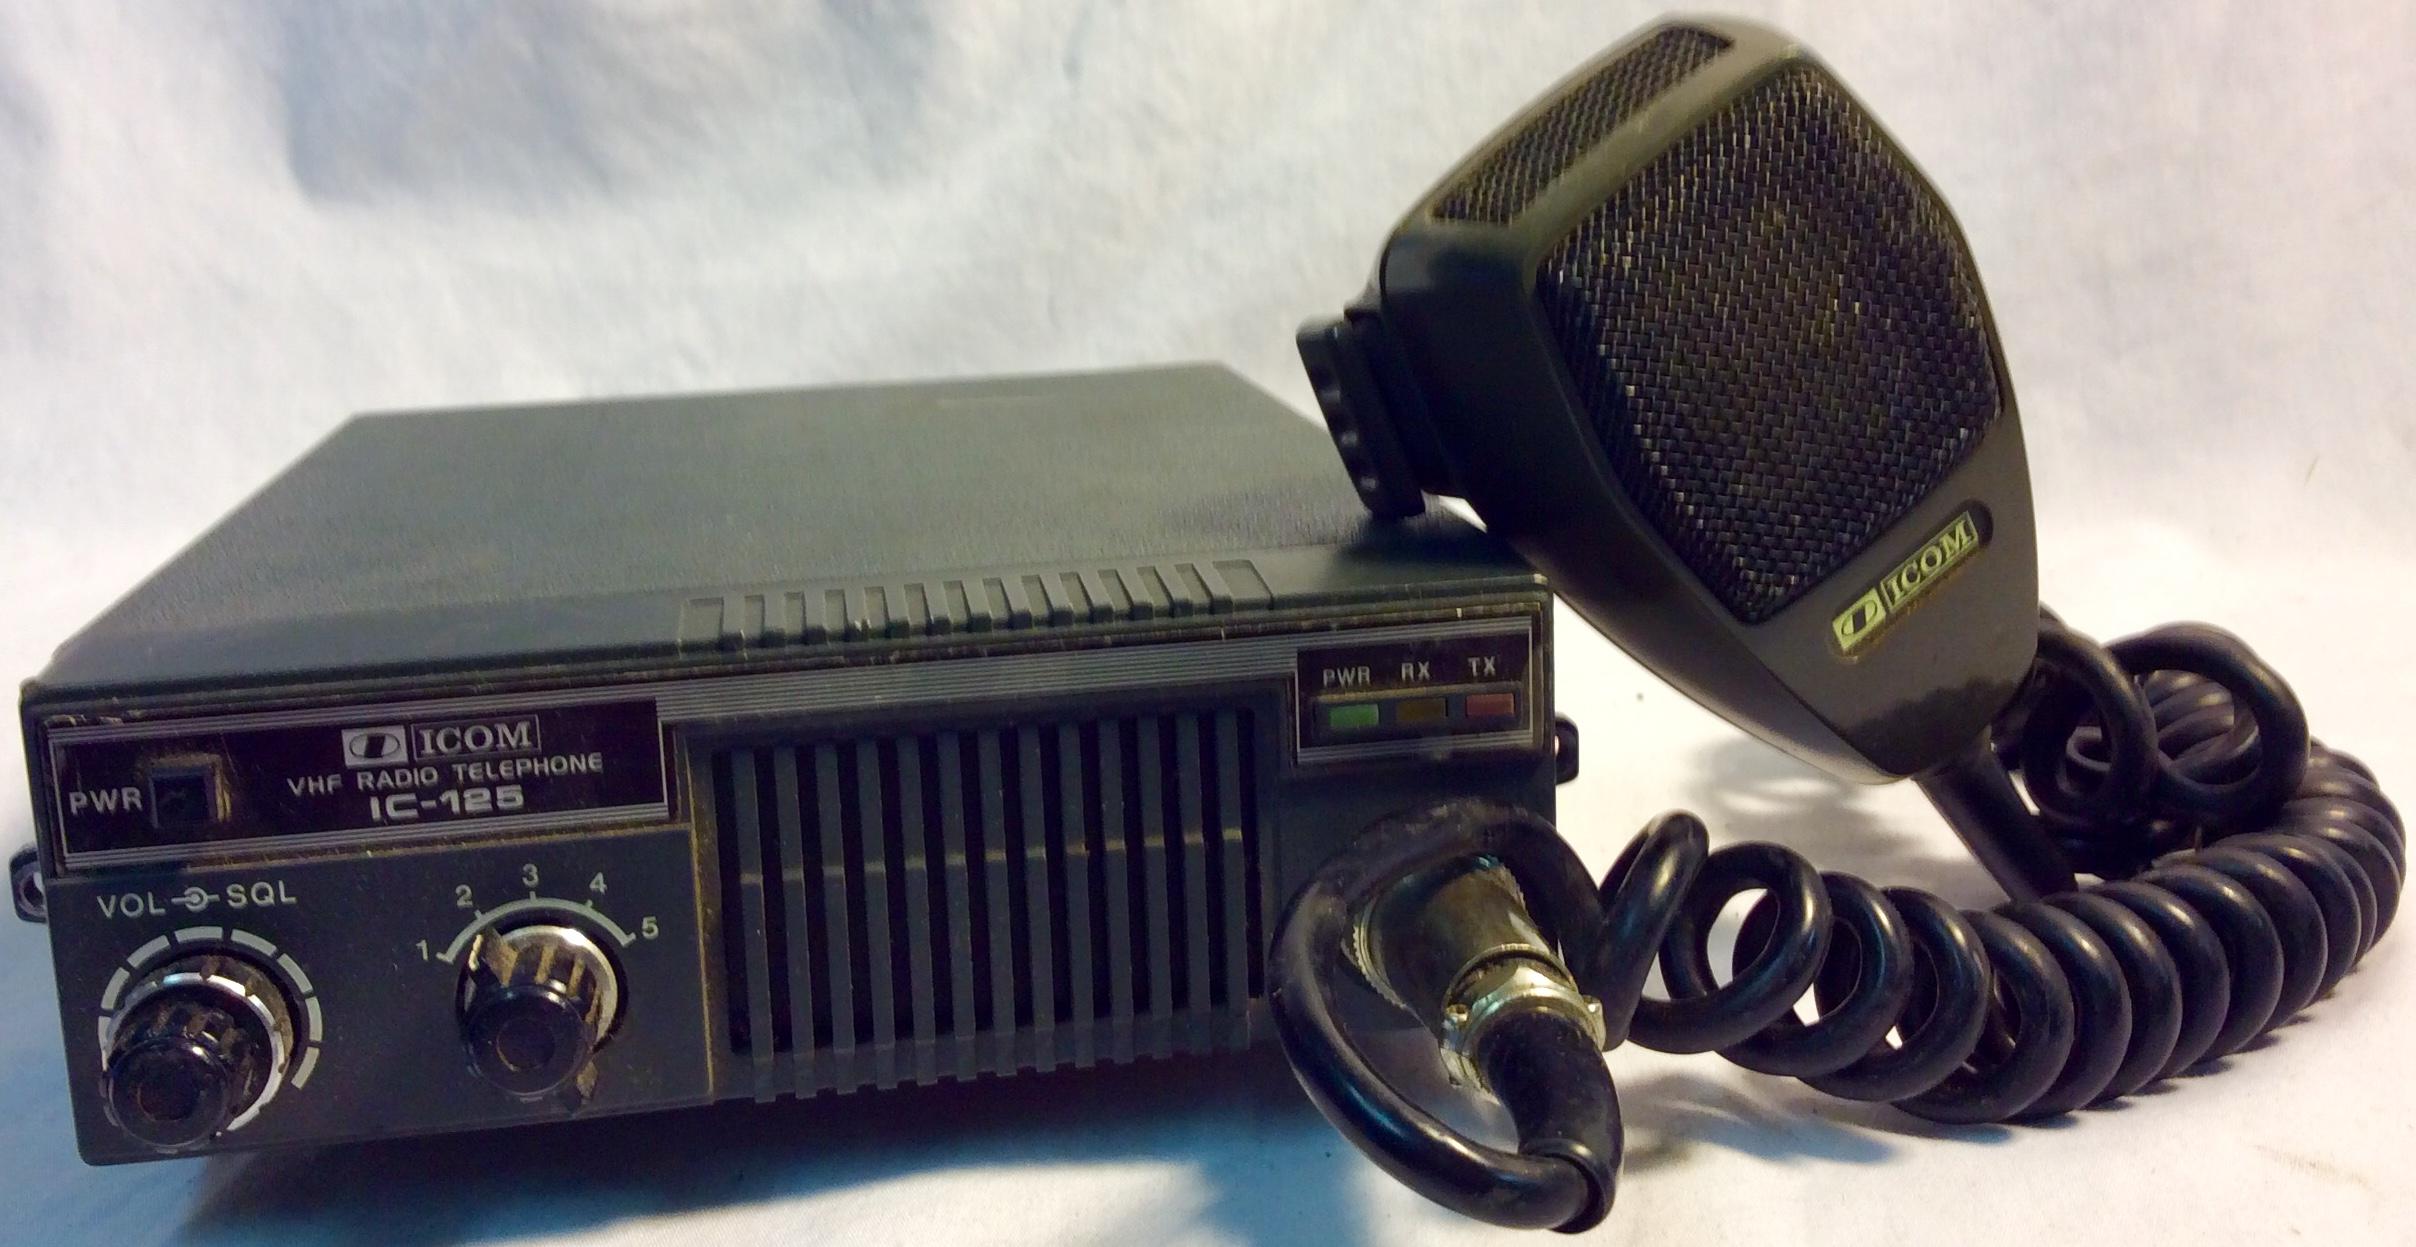 Vintage Icom Mobile VHF Radio Telephone